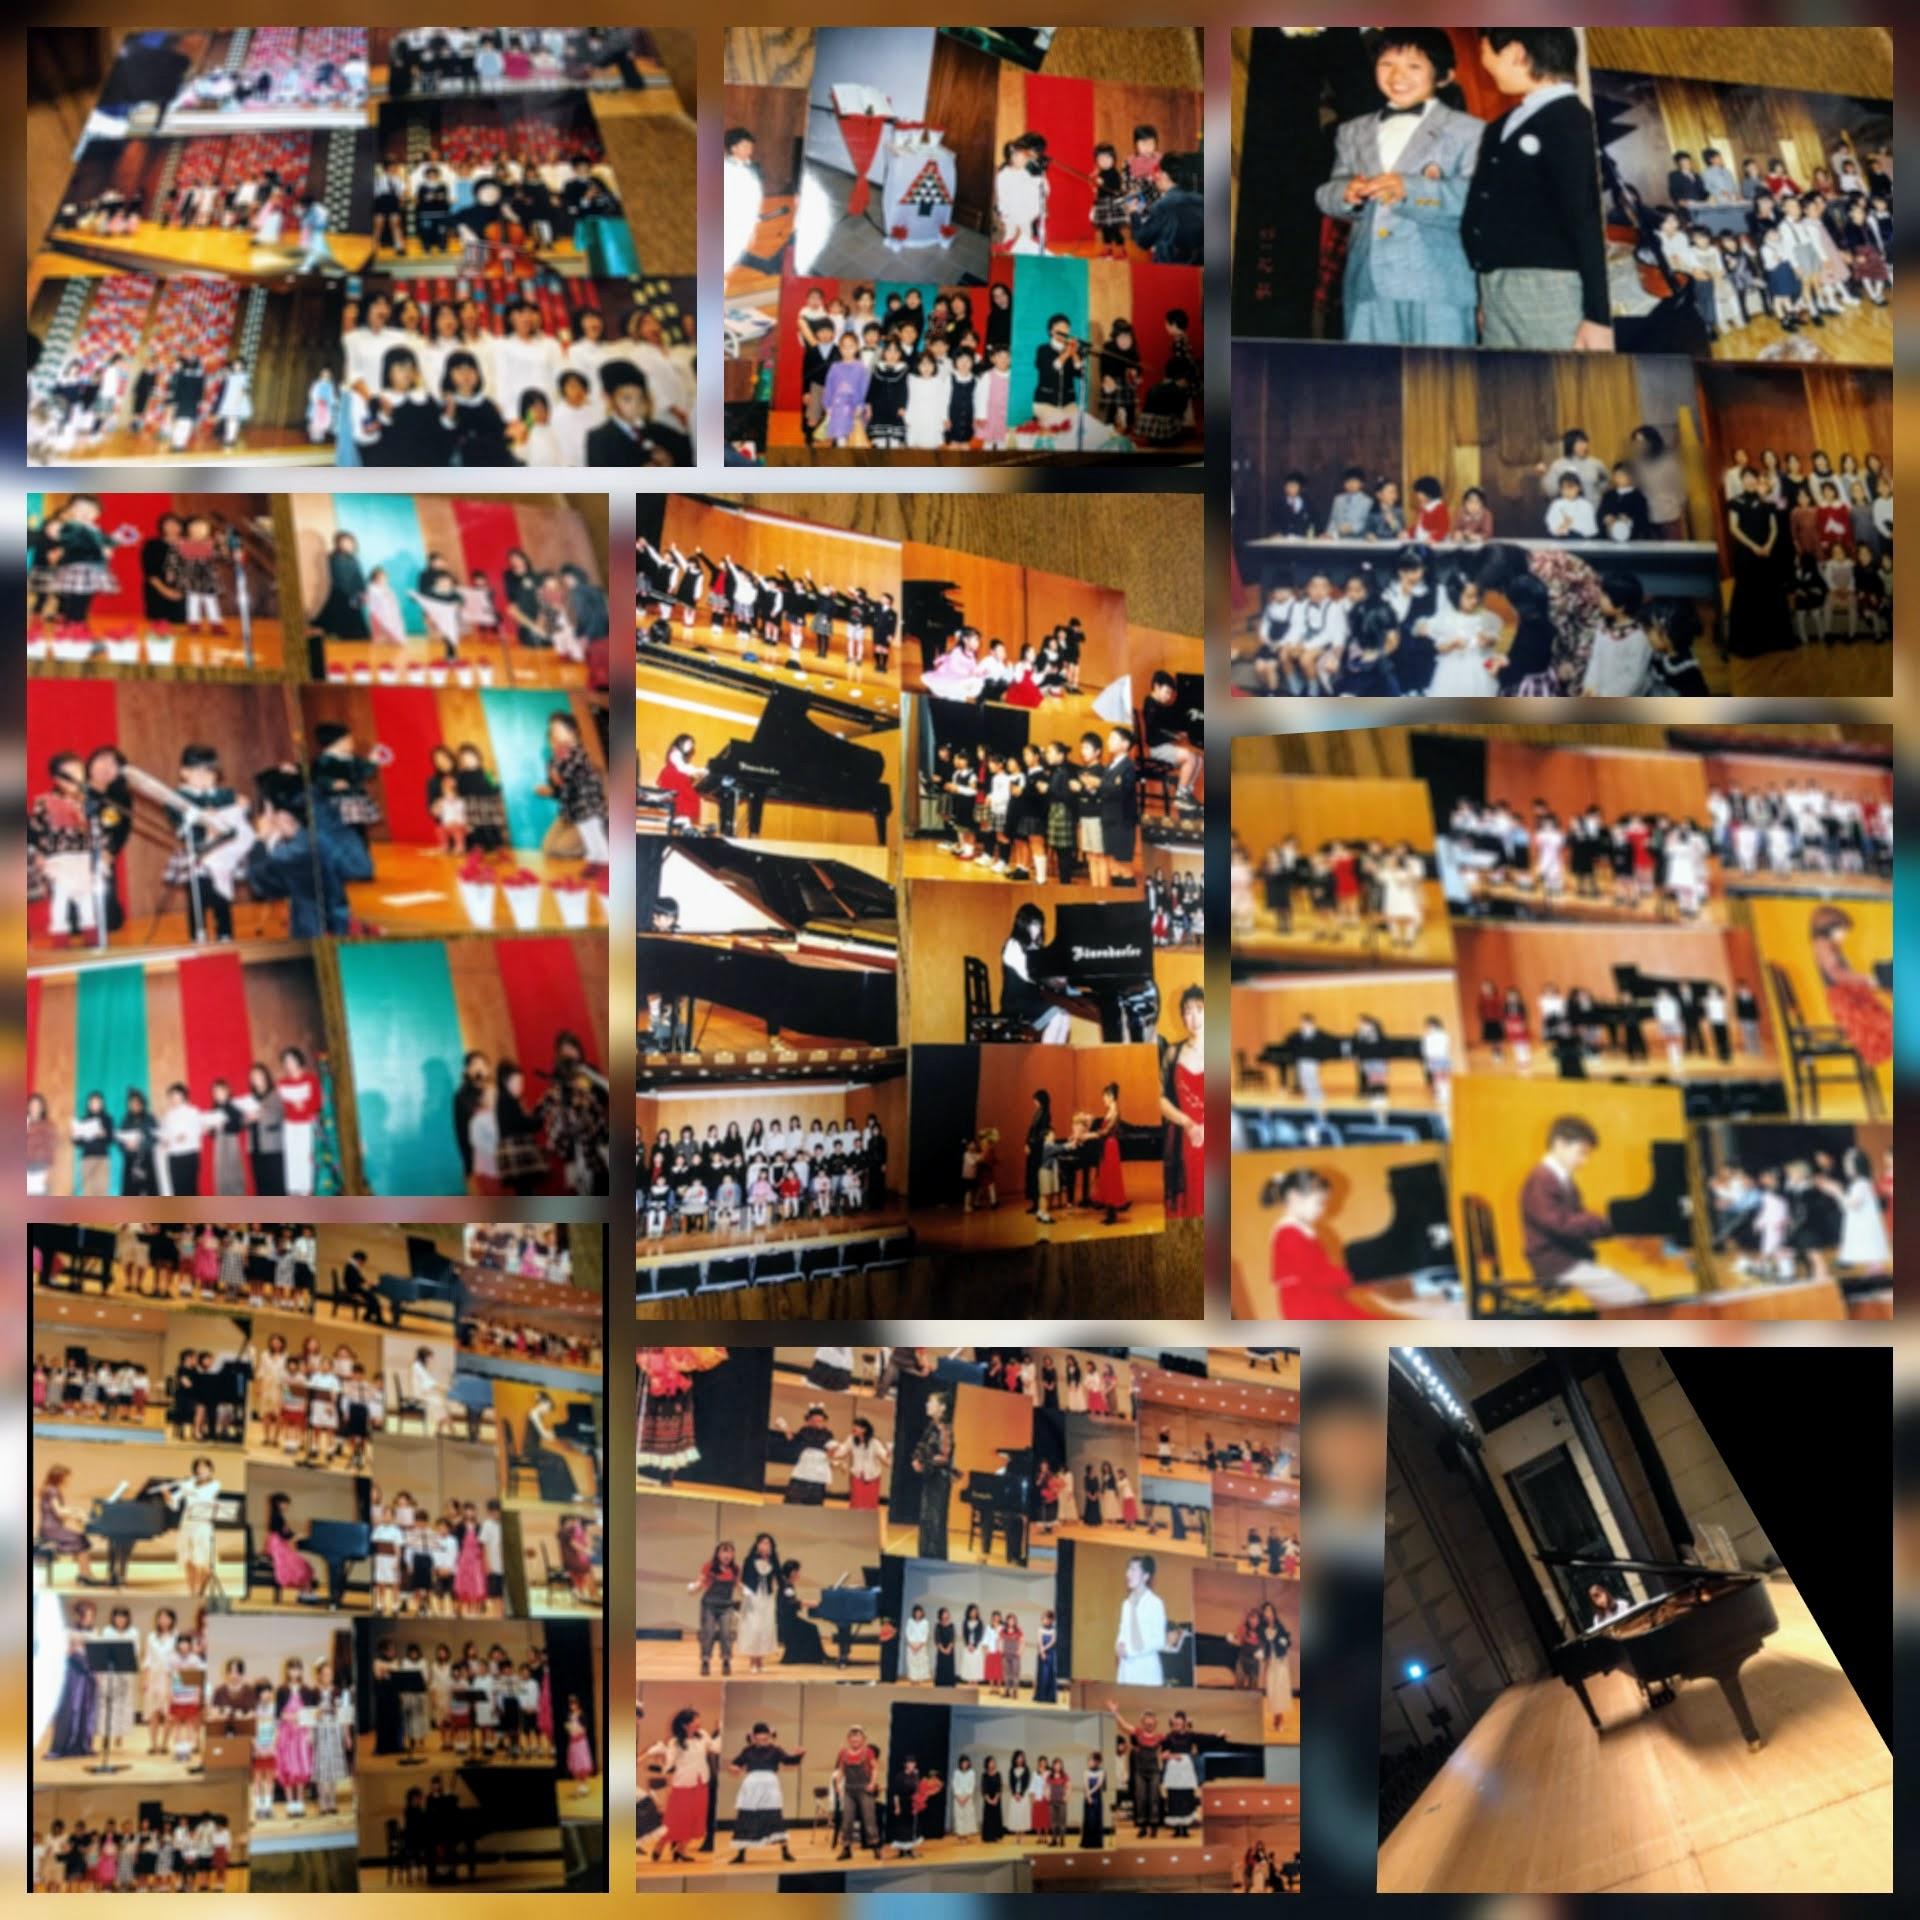 Maple音楽教室♪立川市羽衣町(西国立徒歩4分)ピアノ、リトミック、声